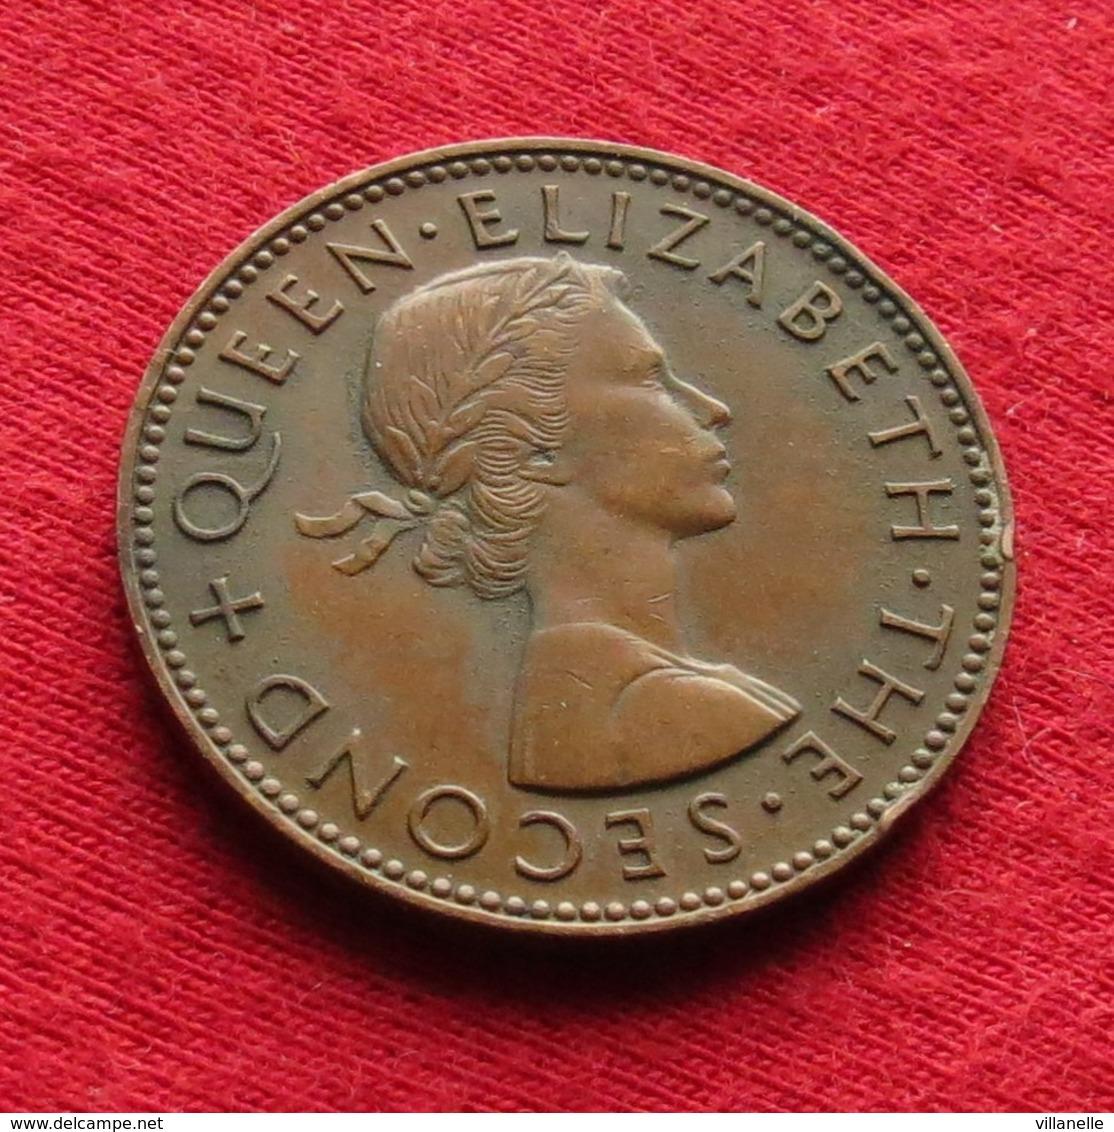 New Zealand 1/2 Half Penny 1958  Nova Zelandia Nuova Zelanda Nouvelle Zelande #2 Wº - New Zealand